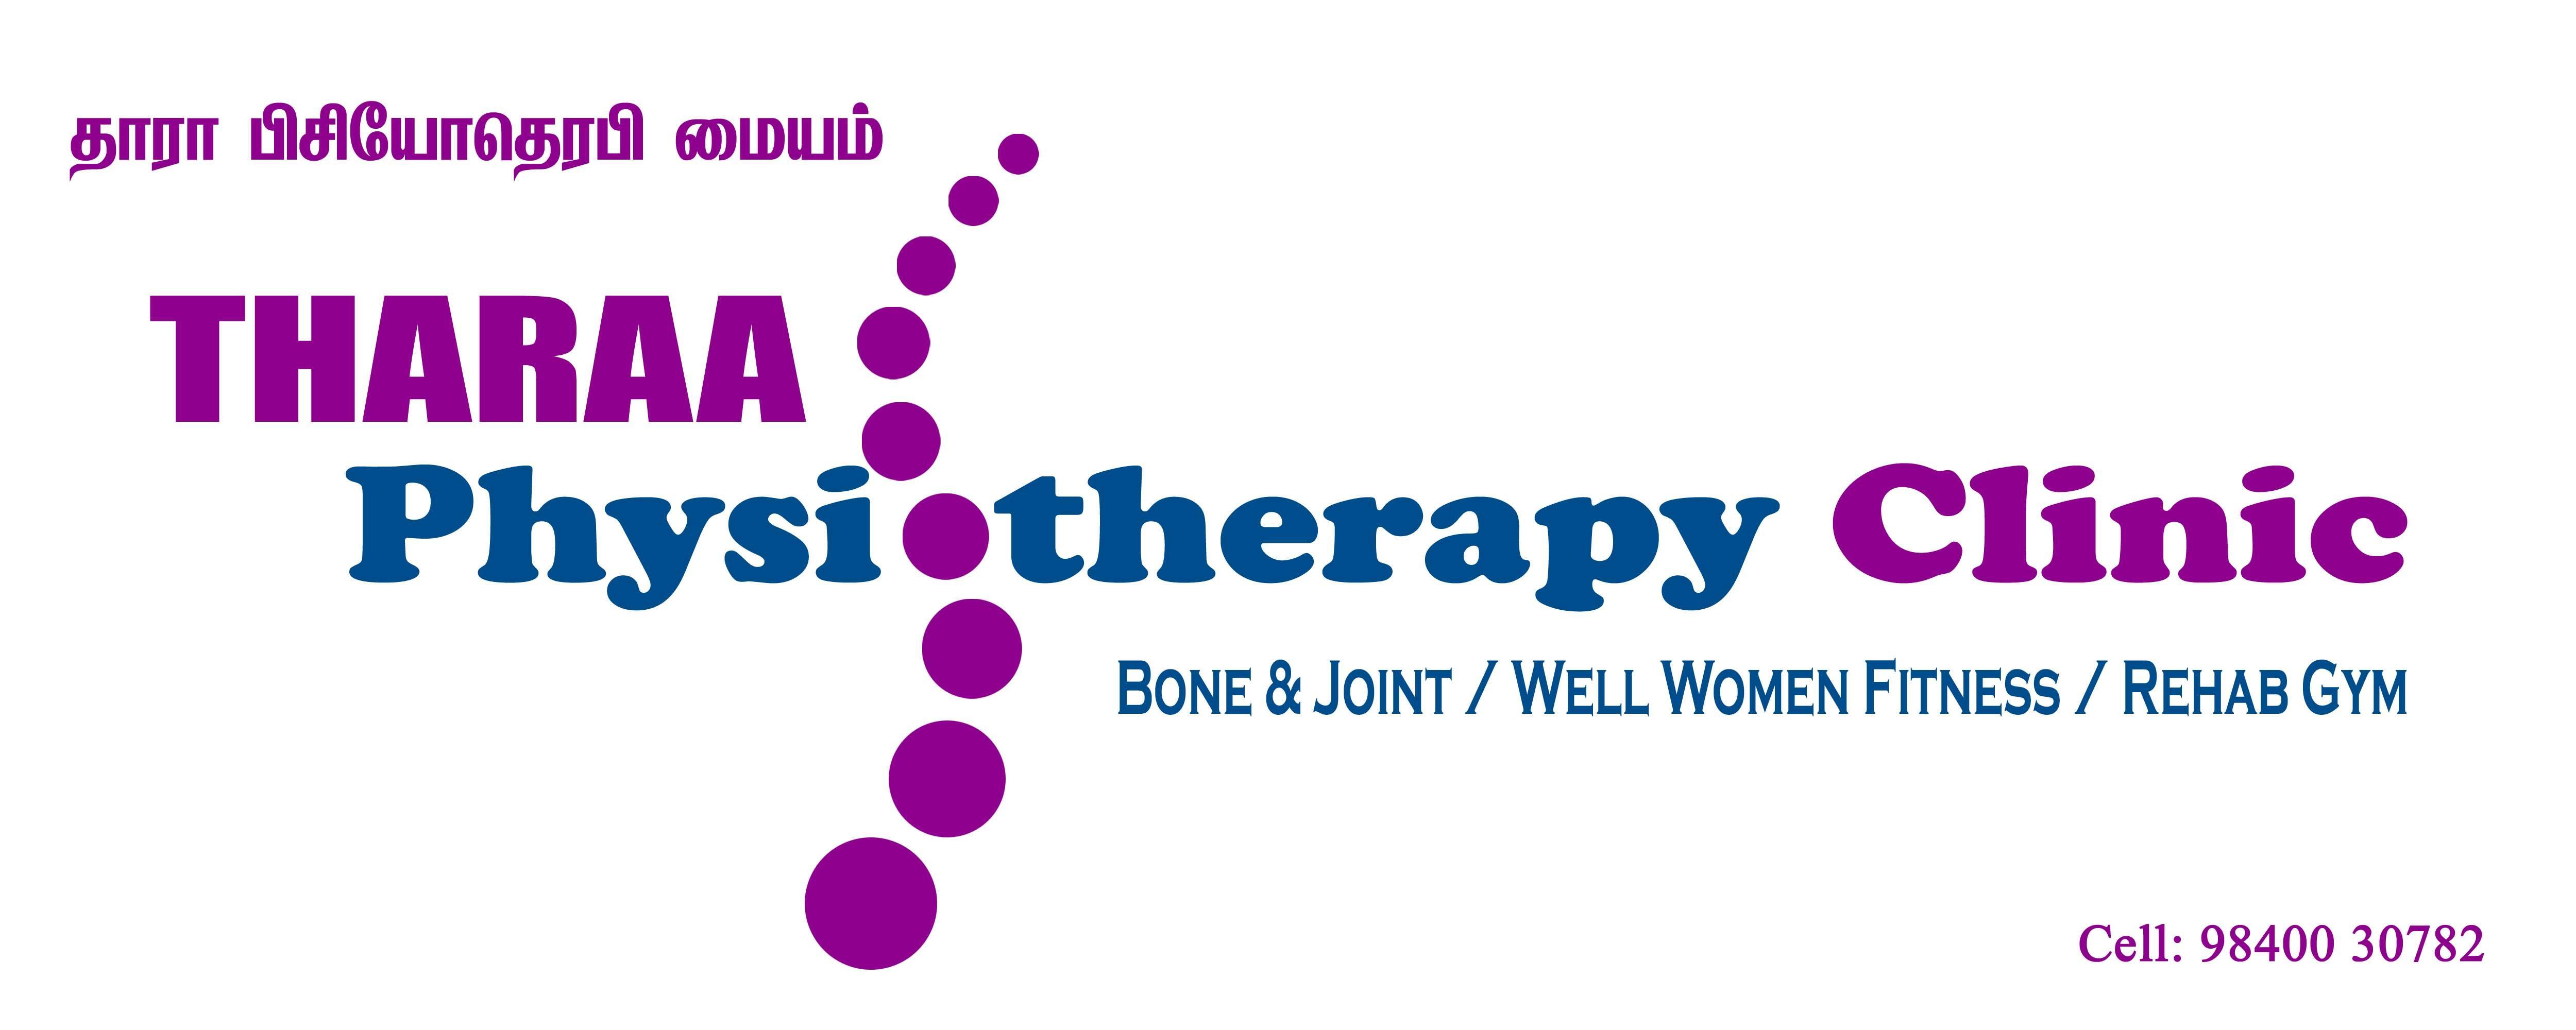 Tharaa Physio Clinic